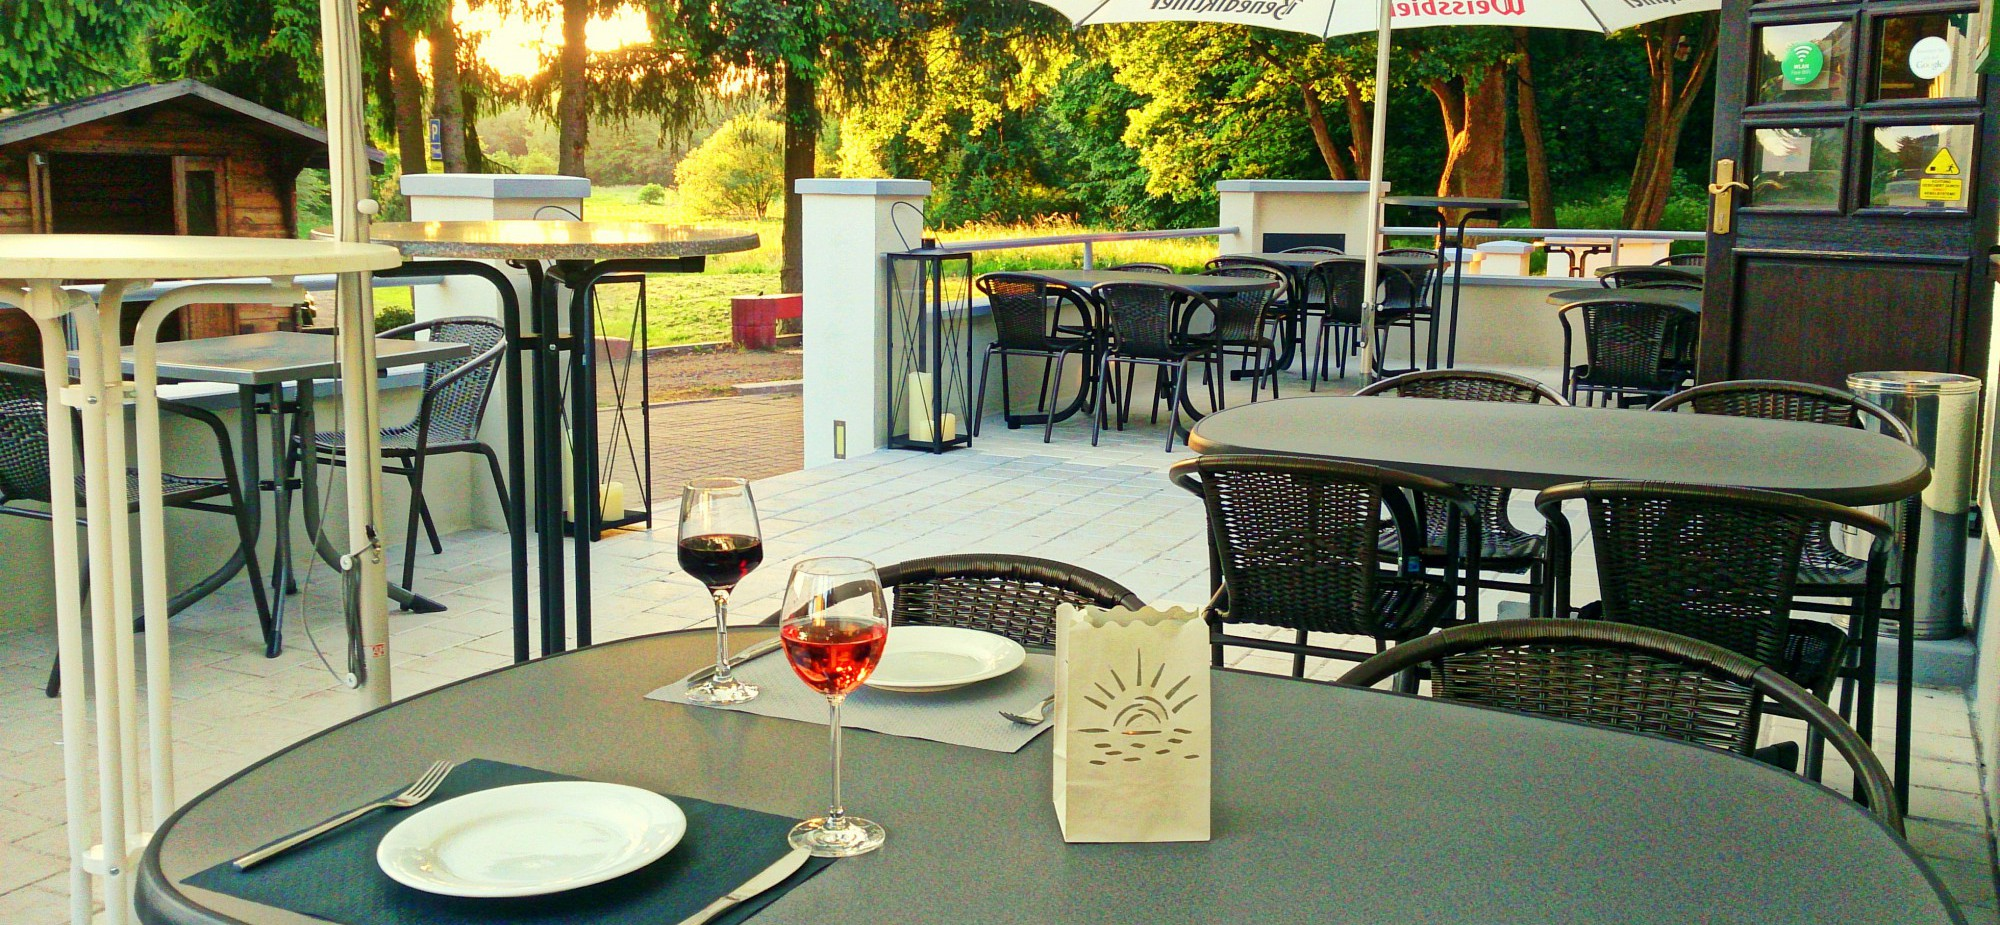 Restaurant-Schmuggelbud-Überherrn-Sommer-Terrasse